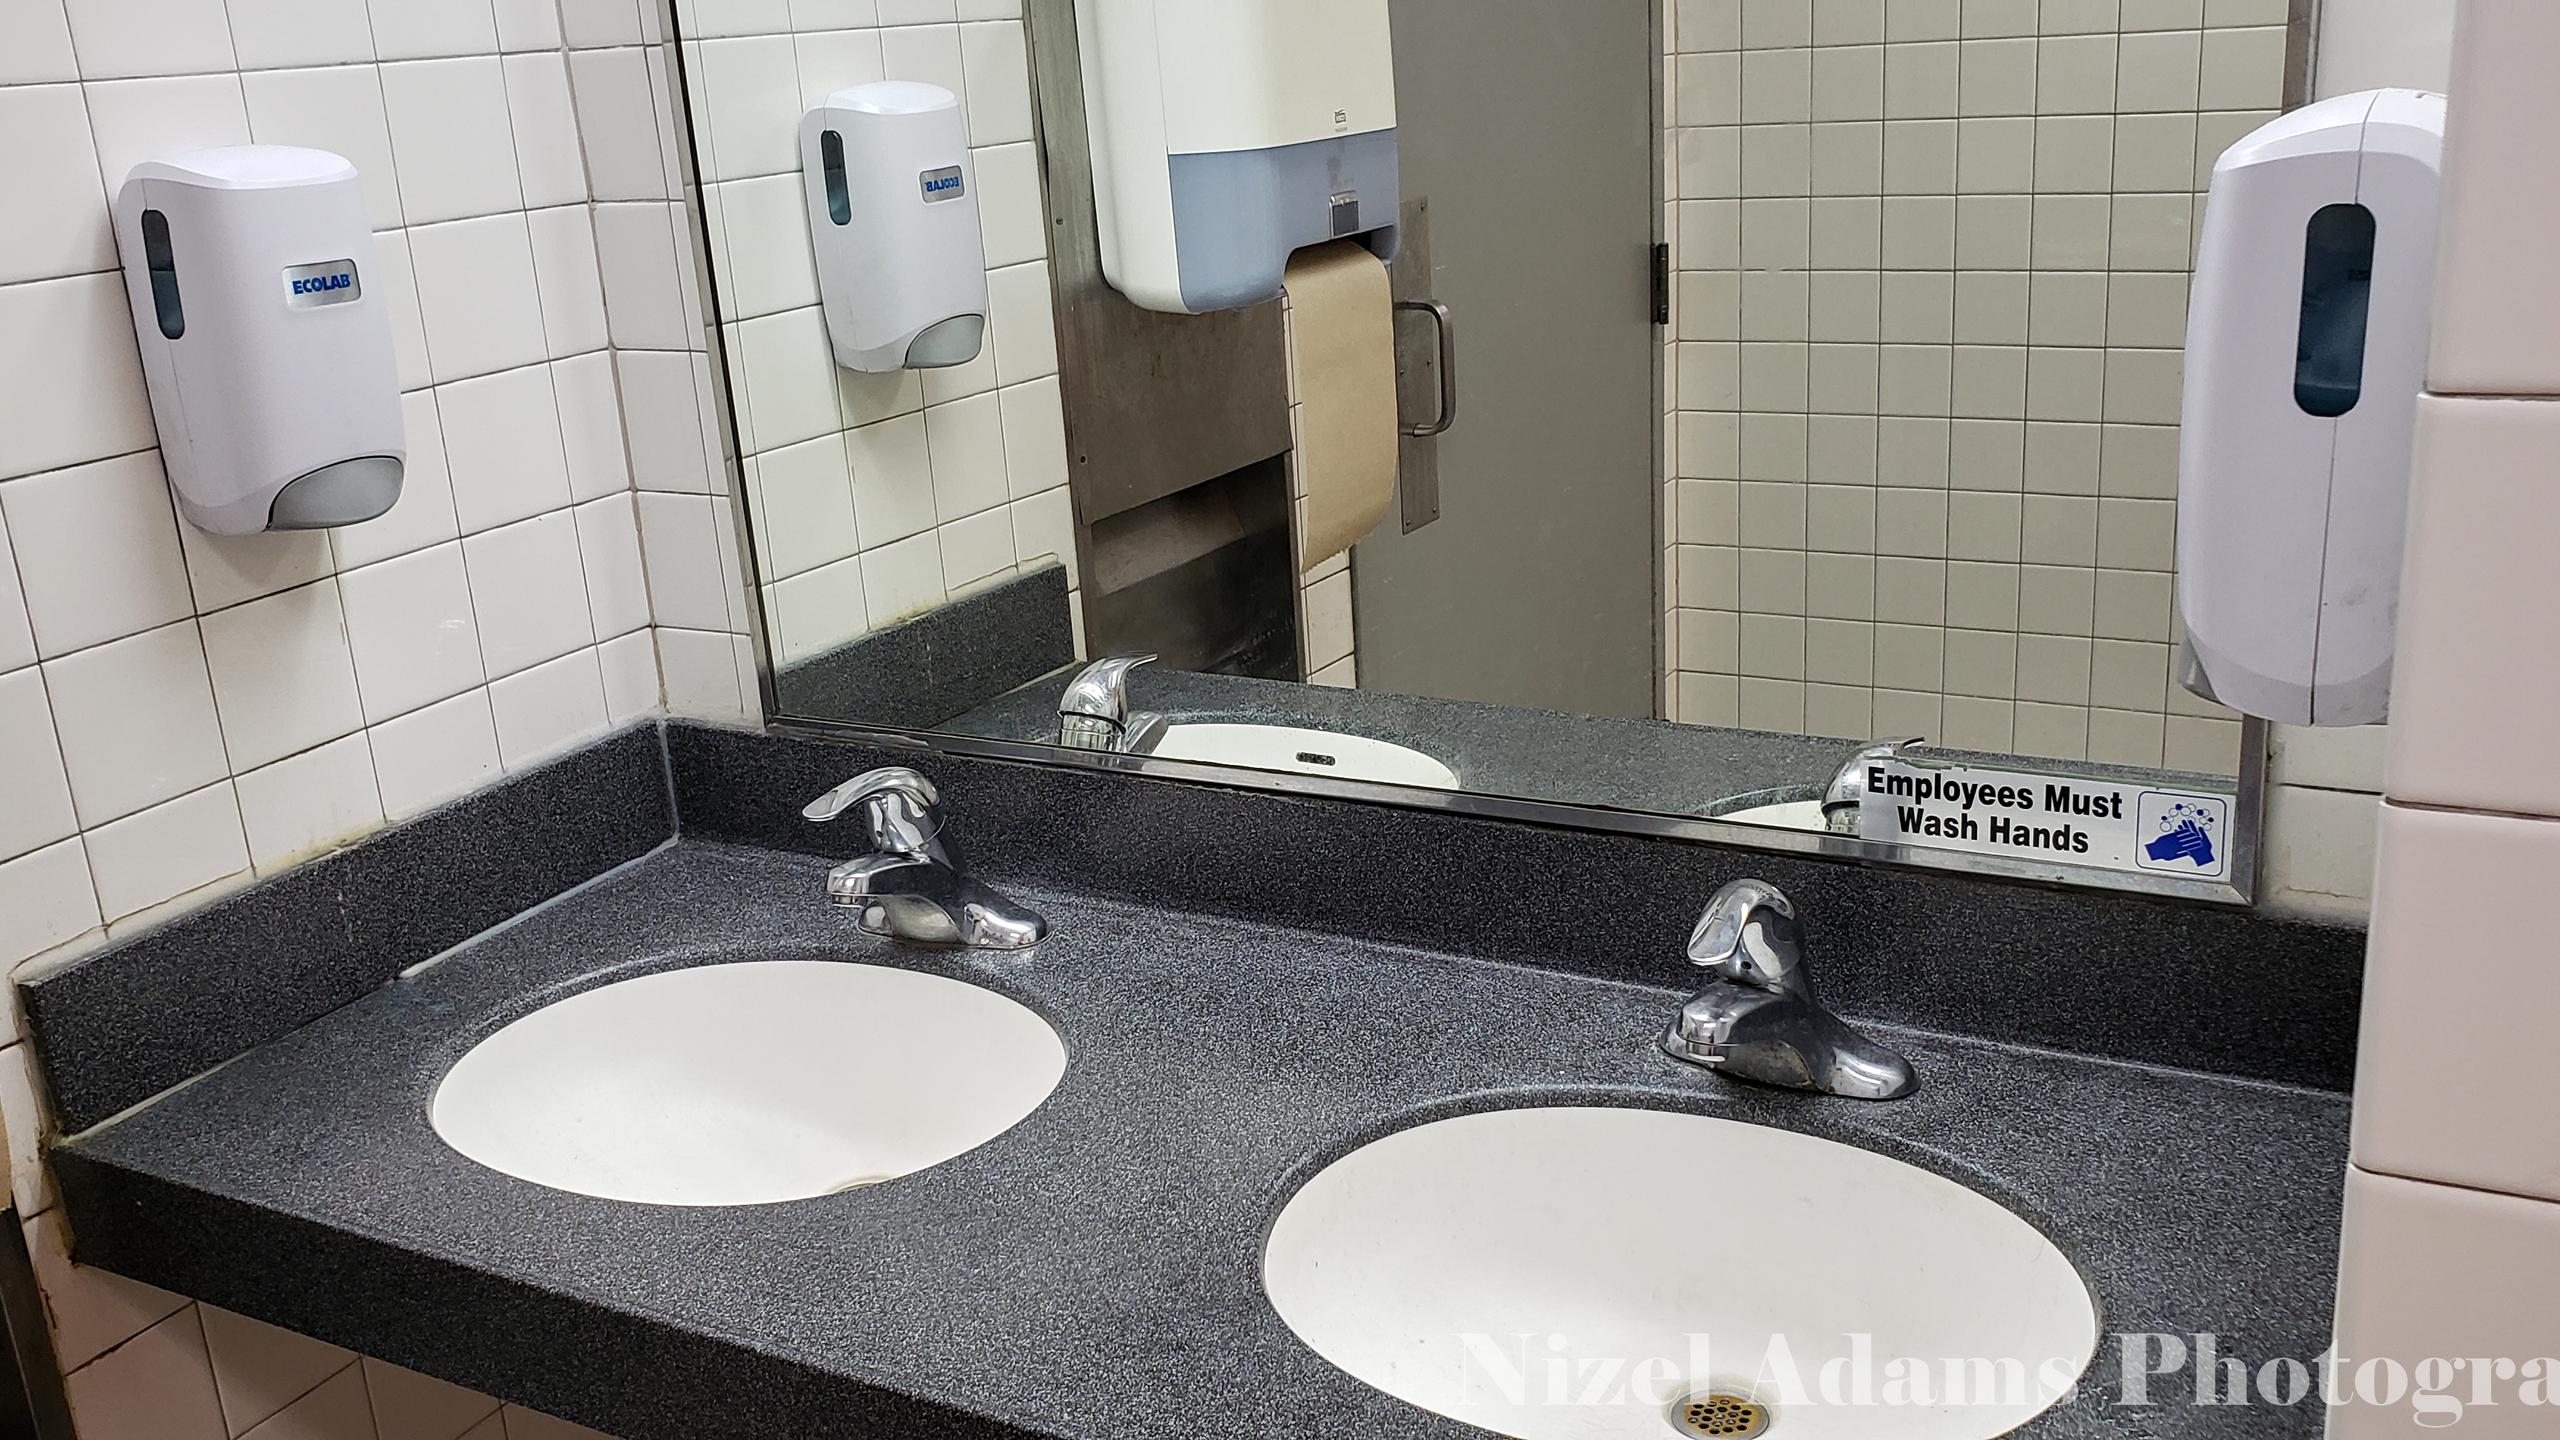 Men's Bathroom Sinks at Steak n' Shake Aurora, Illinois